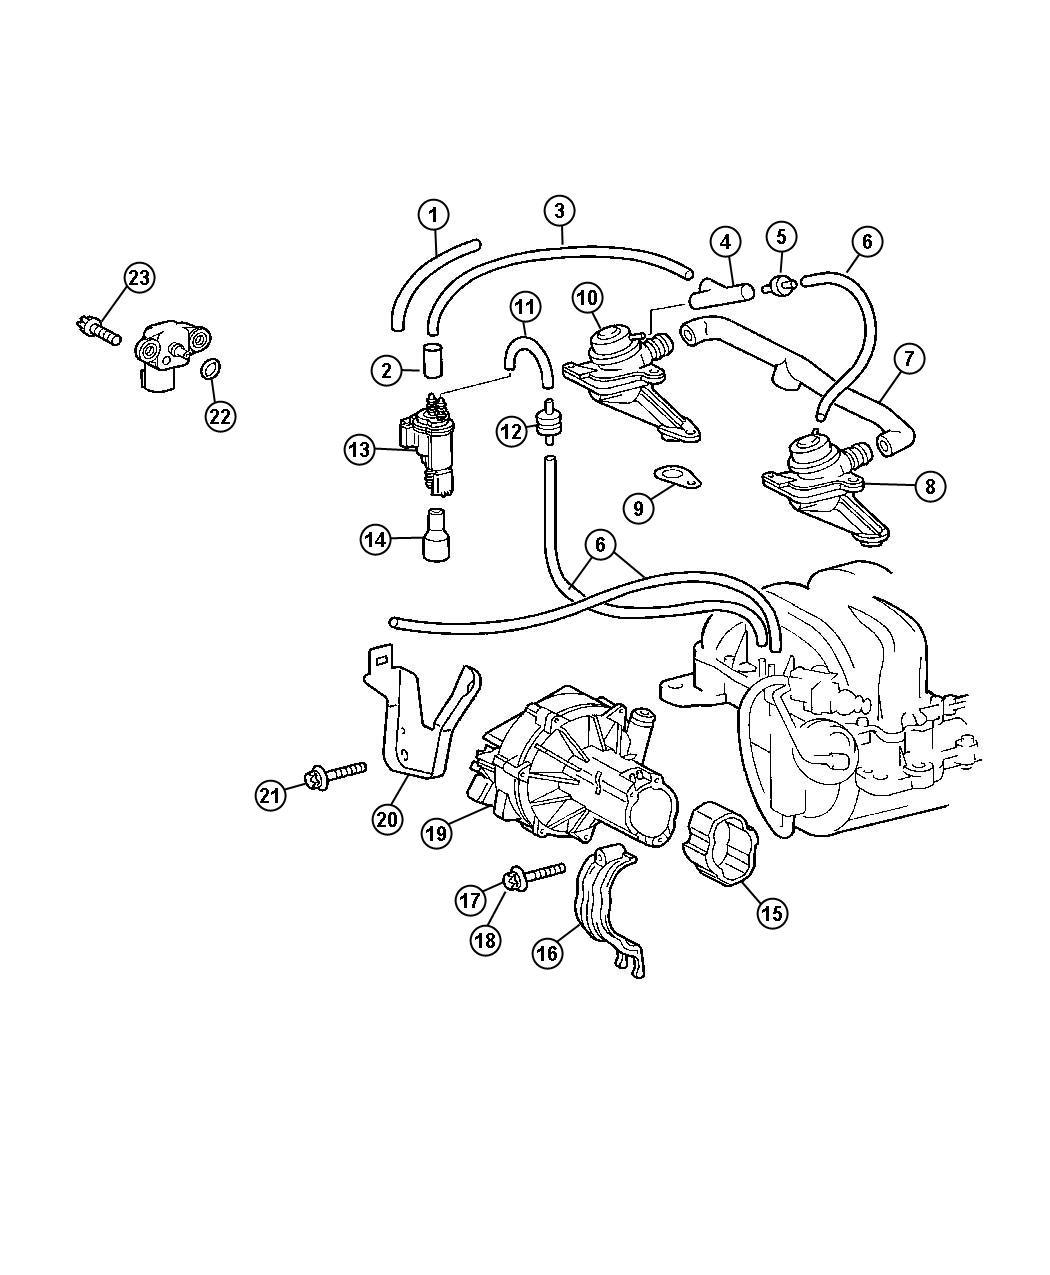 Chrysler Crossfire Air Pump